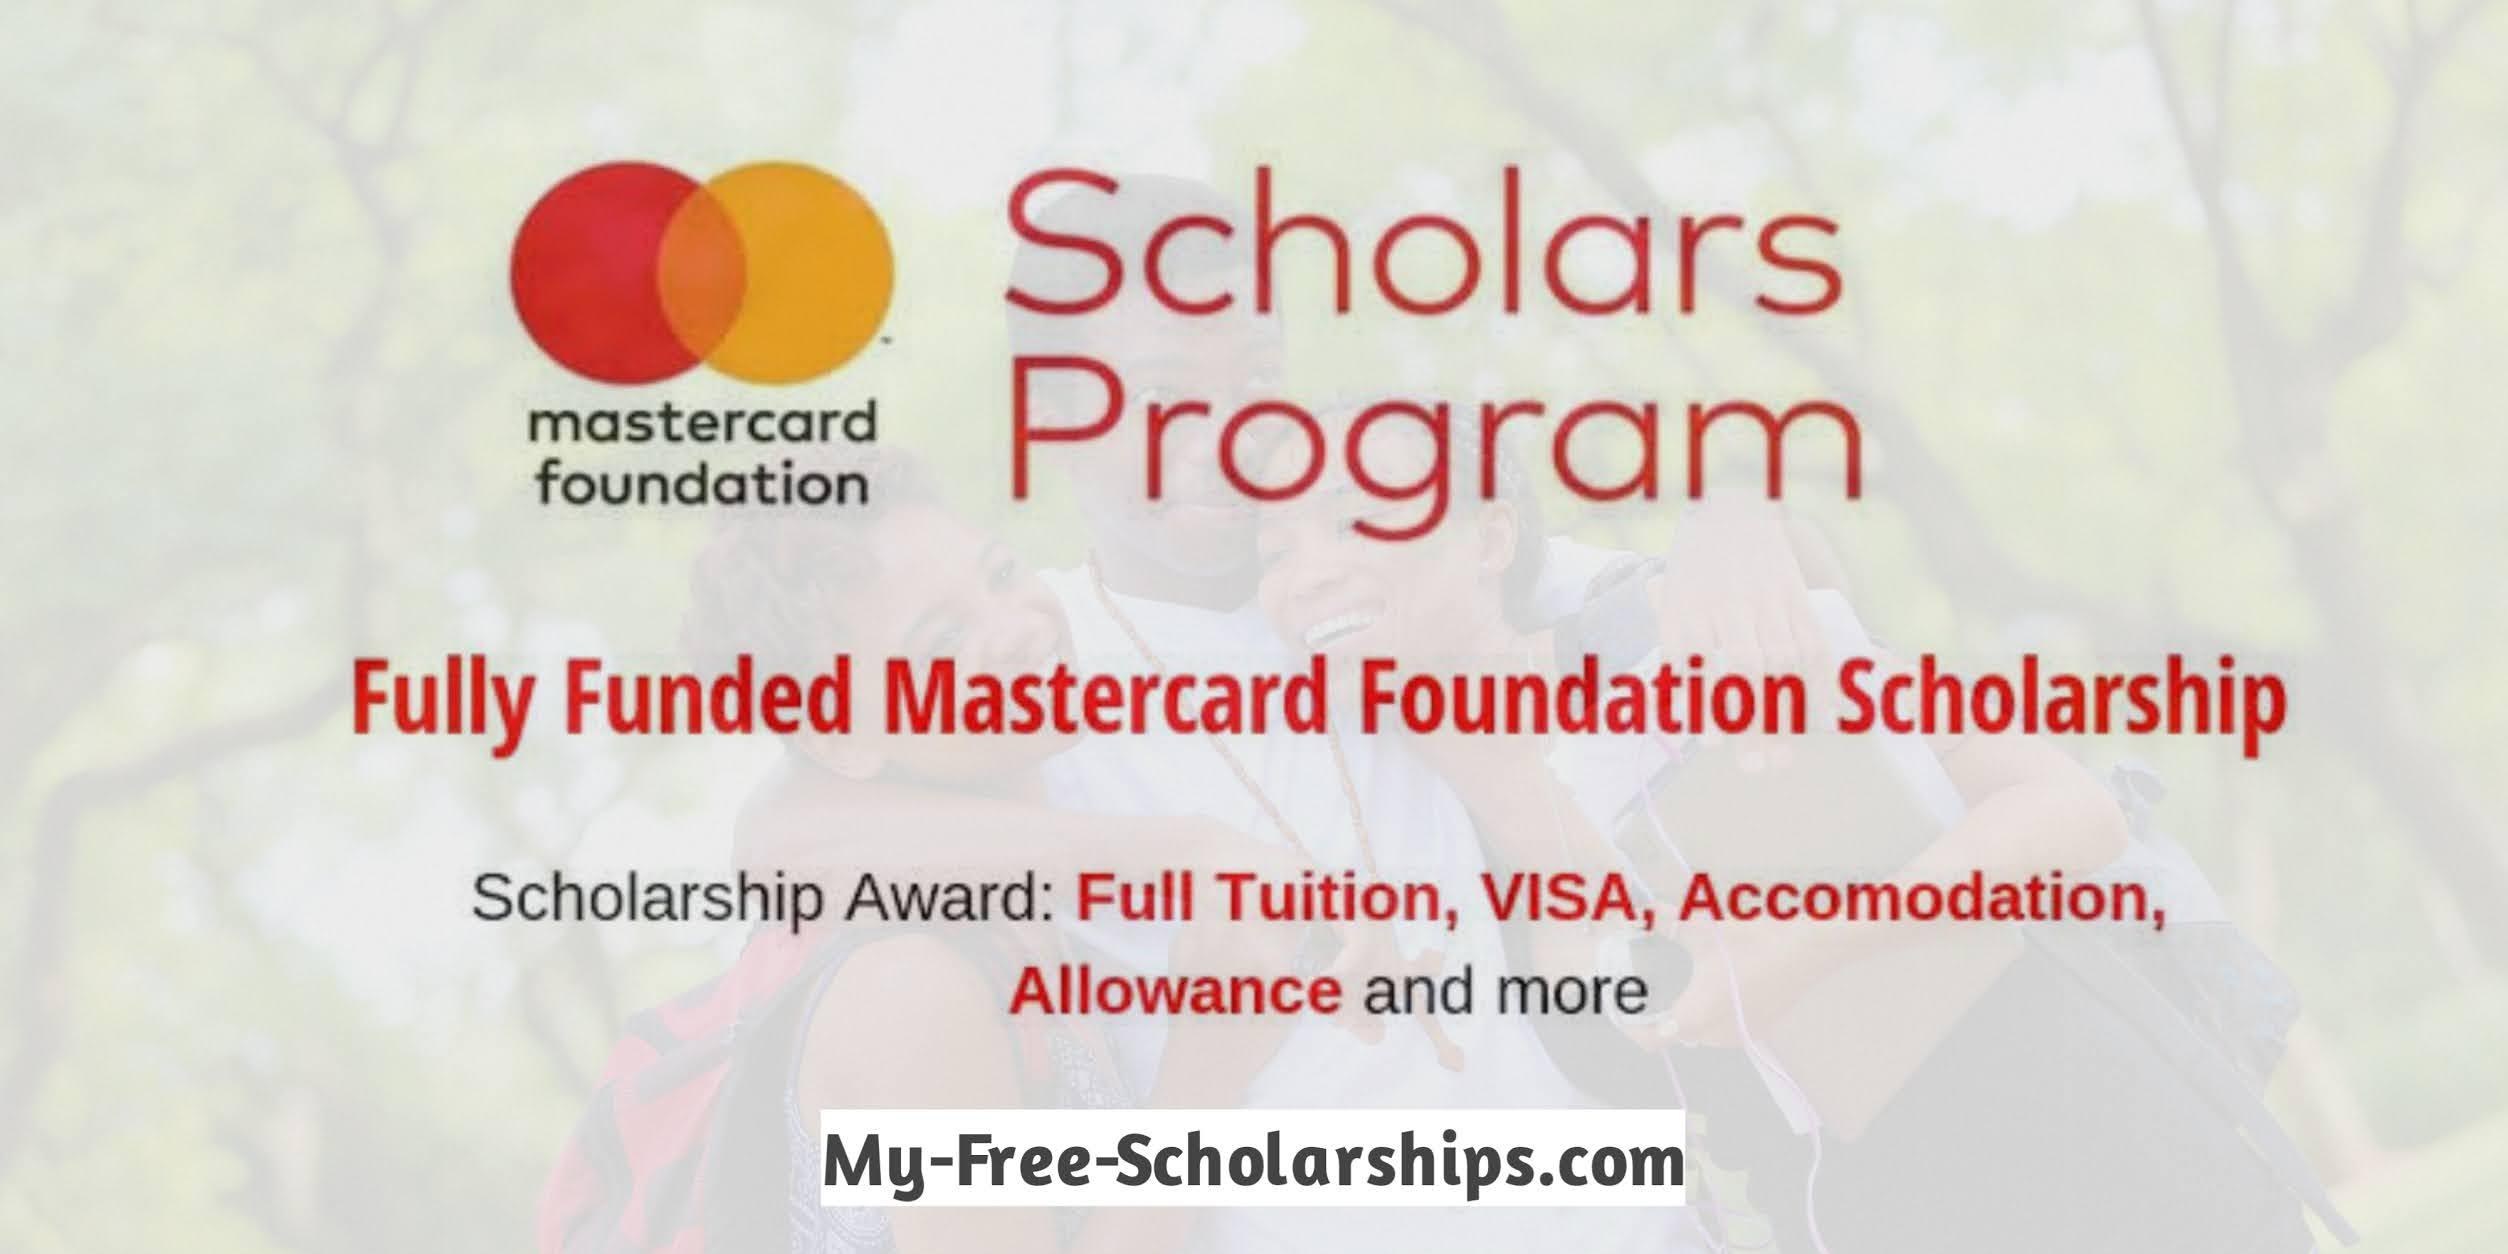 University Of Pretoria MasterCard Scholarship 2022